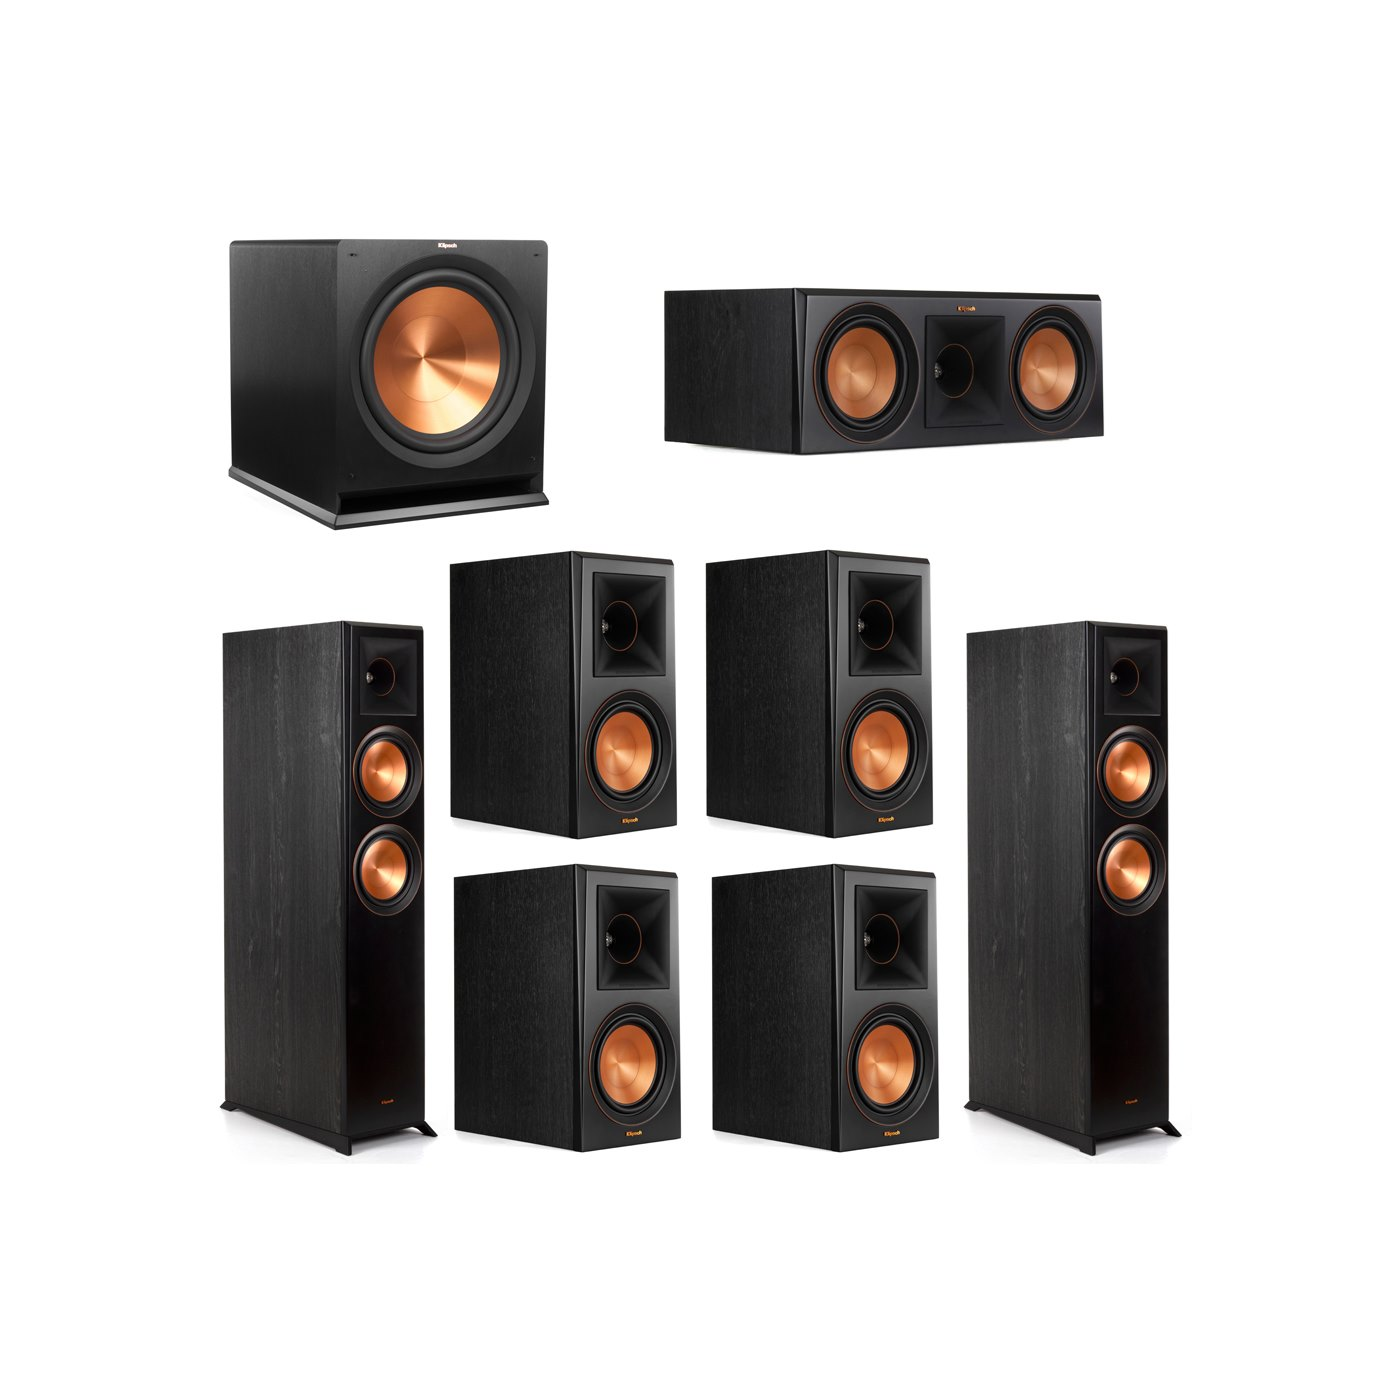 Klipsch 7.1 System with 2 RP-6000F Floorstanding Speakers, 1 Klipsch RP-600C Center Speaker, 4 Klipsch RP-600M Surround Speakers, 1 Klipsch R-115SW Subwoofer